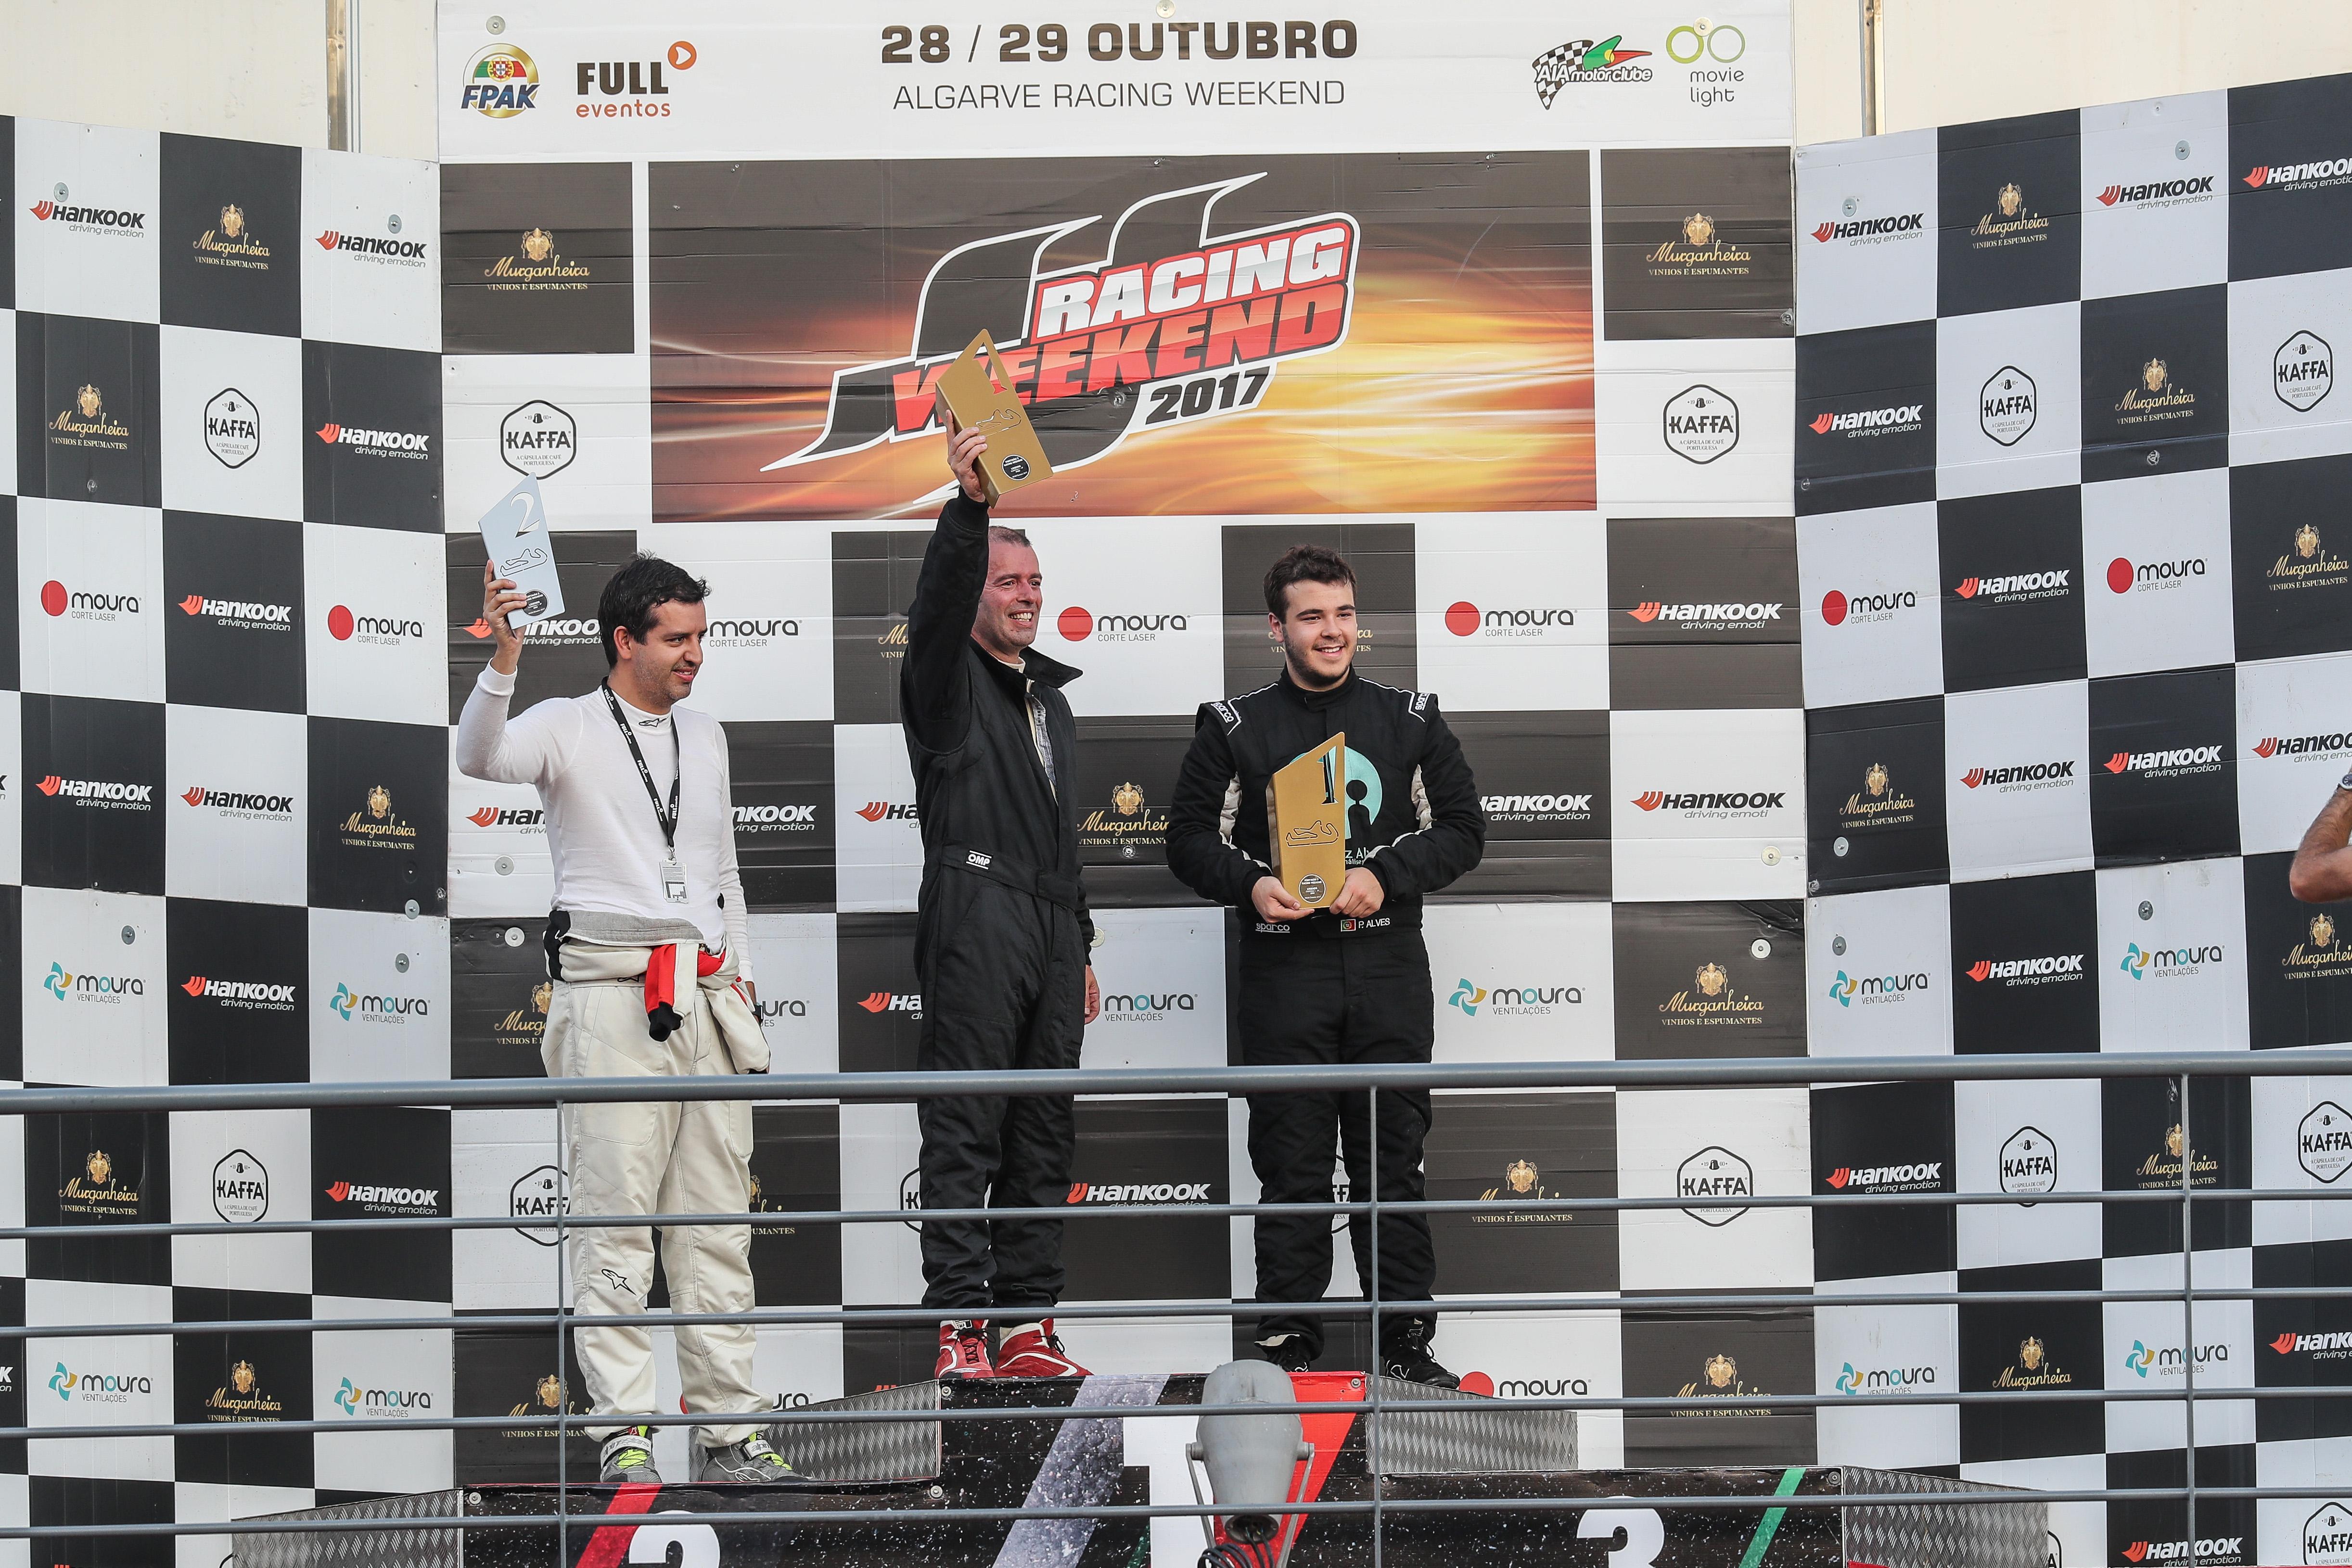 portimao lcc podium